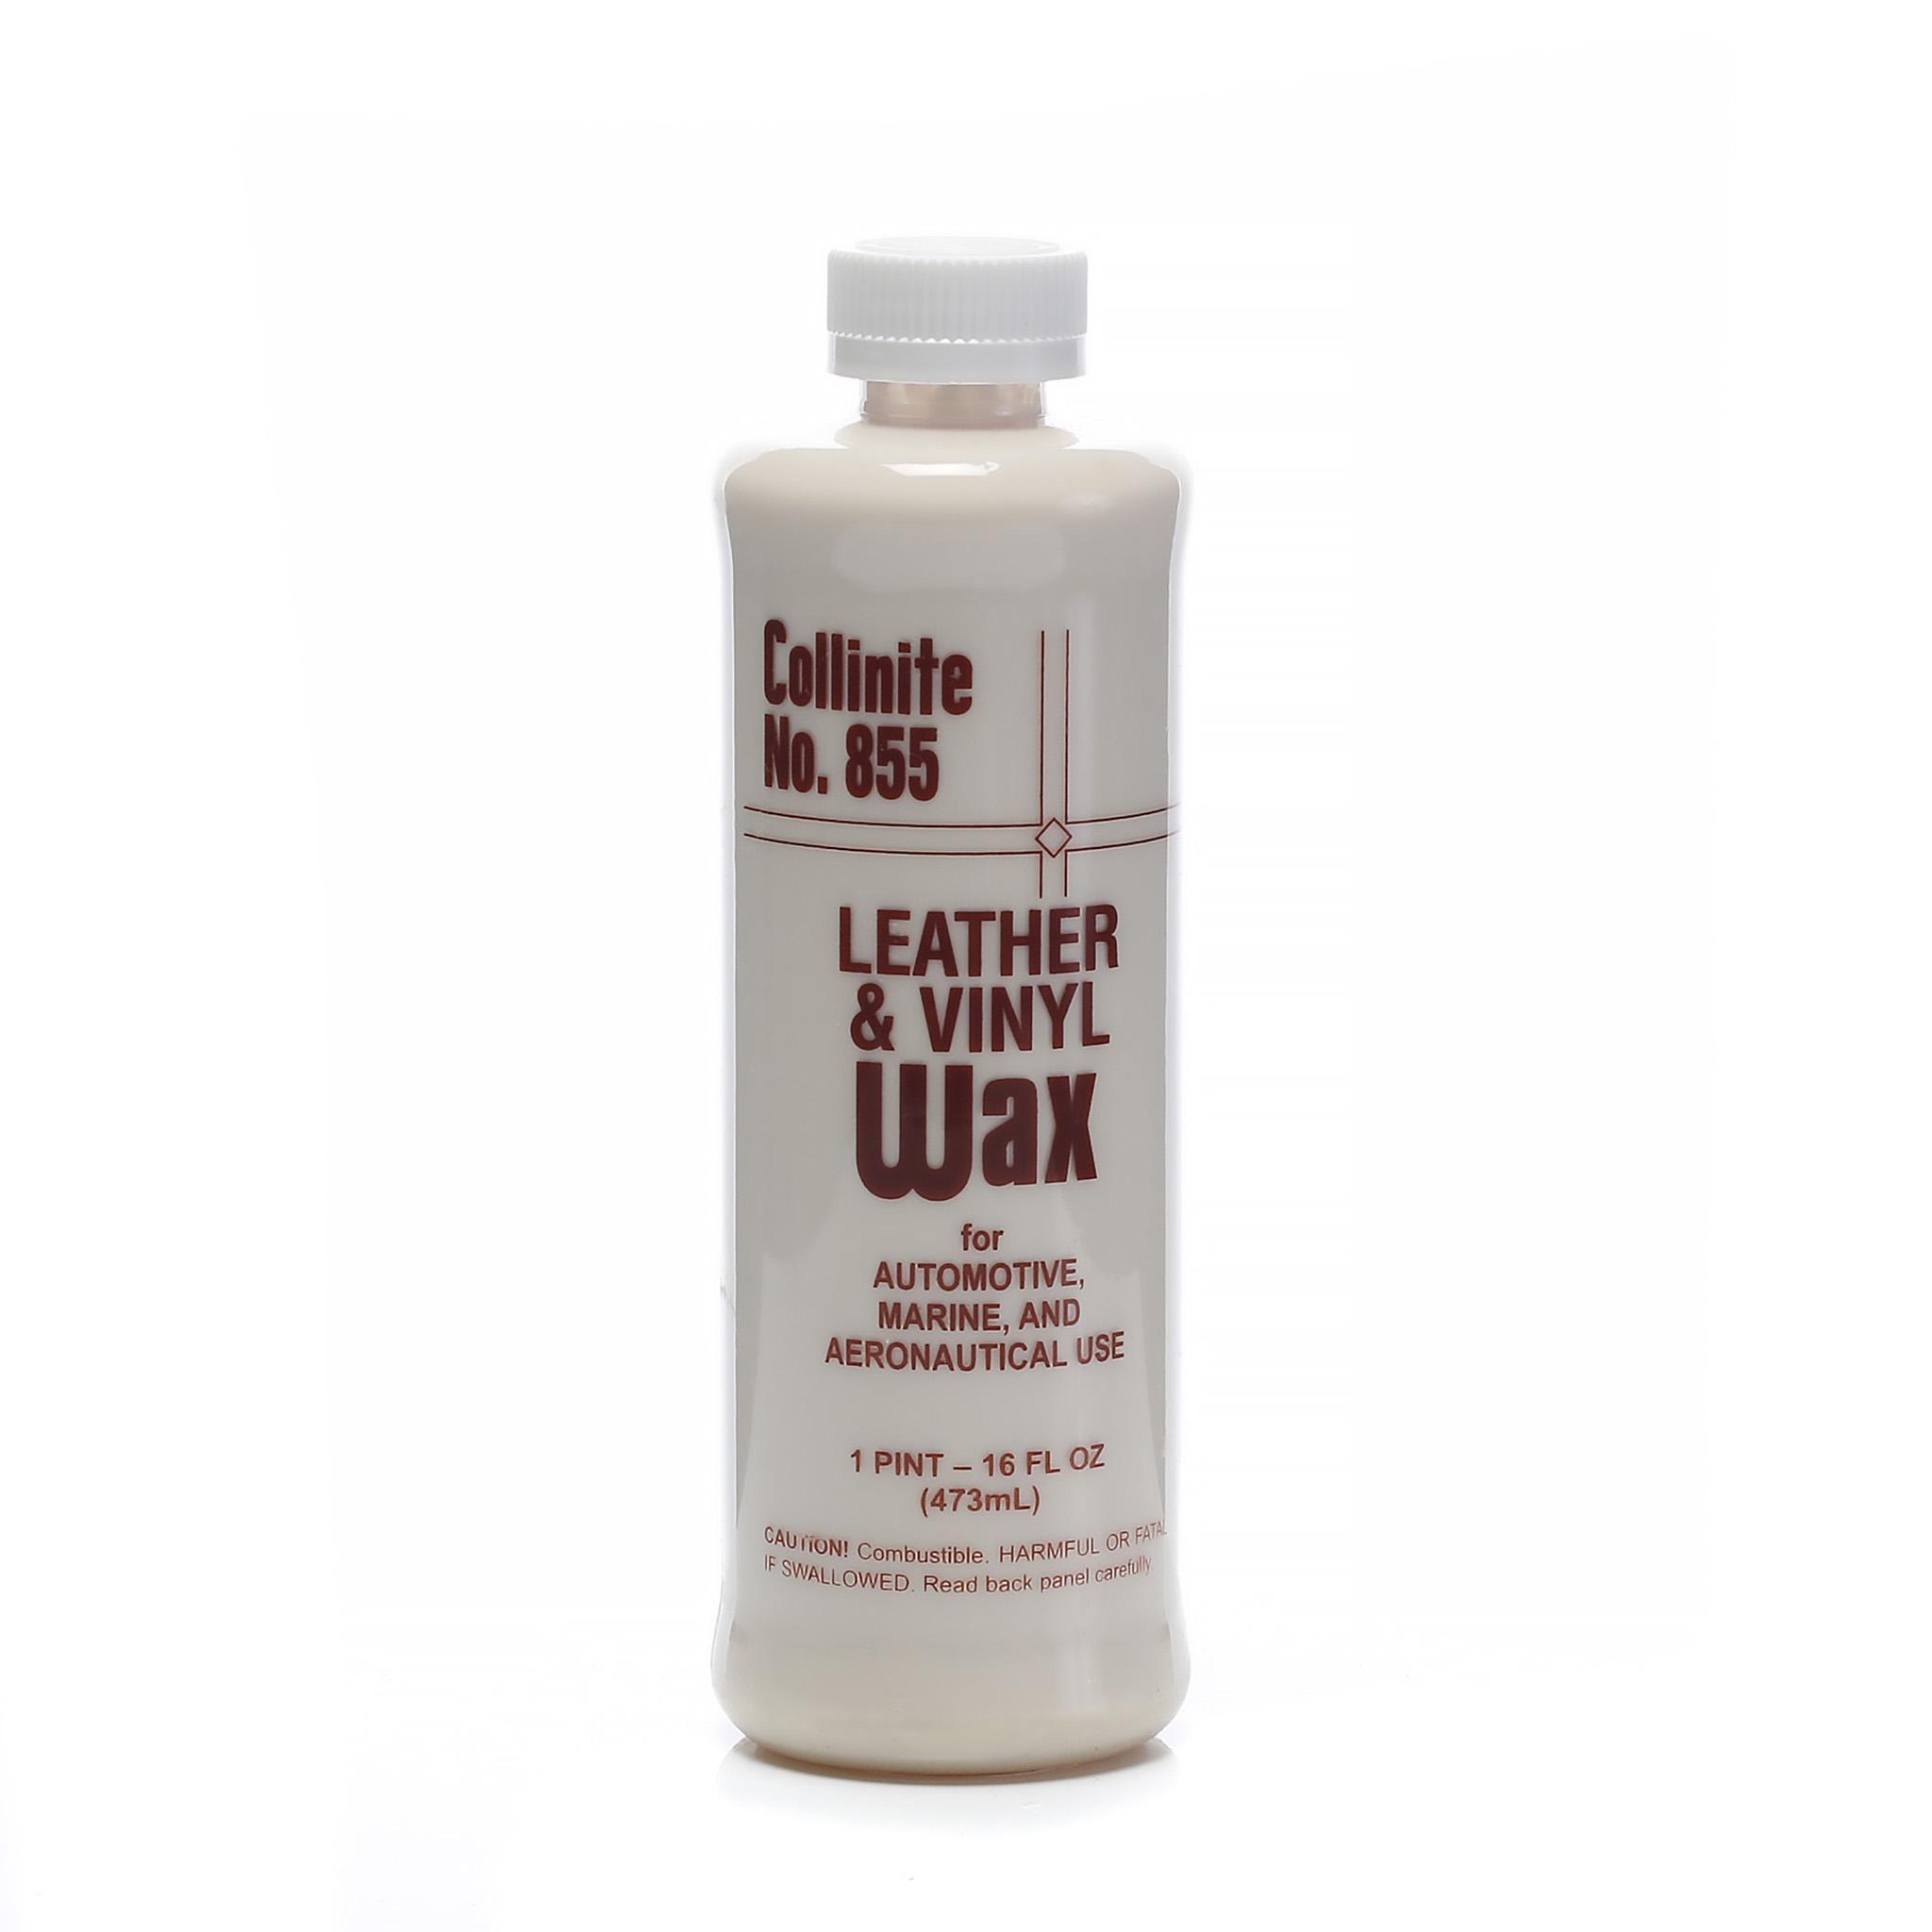 Läderbehandling Collinite 855 Sapphire Leather & Vinyl Treatment Wax, 470 ml